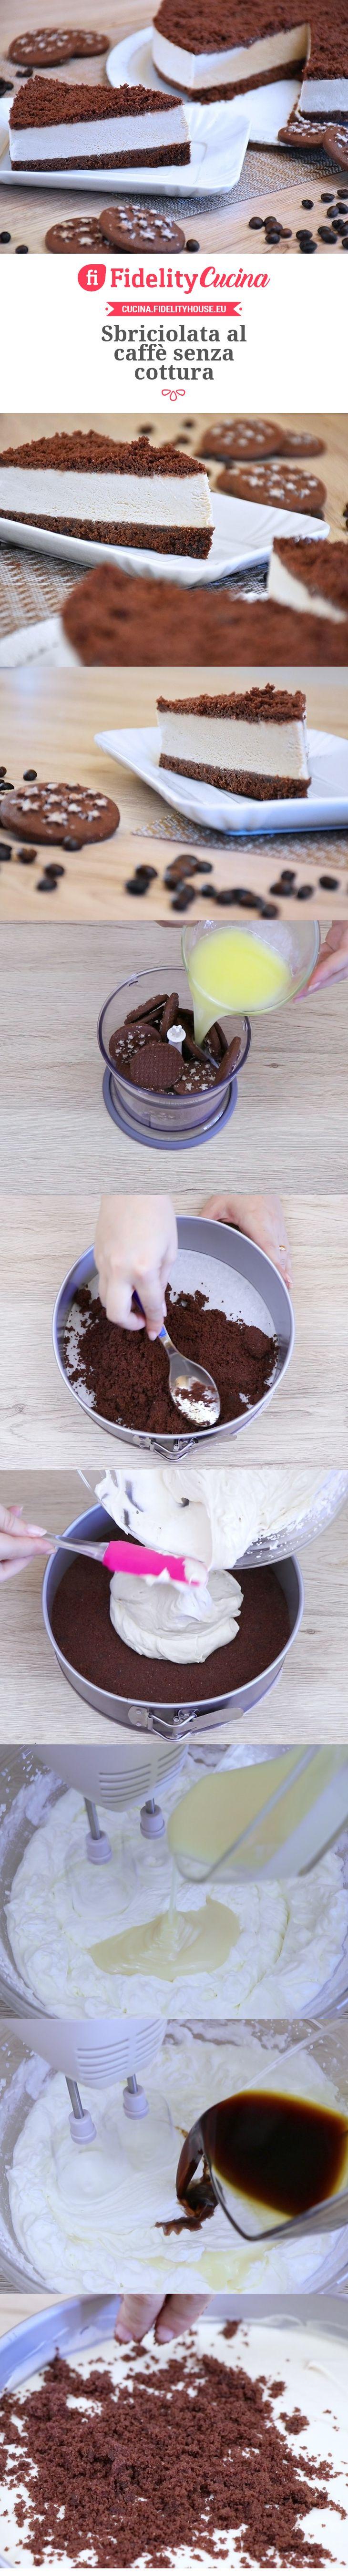 Sbriciolata al caffè senza cottura